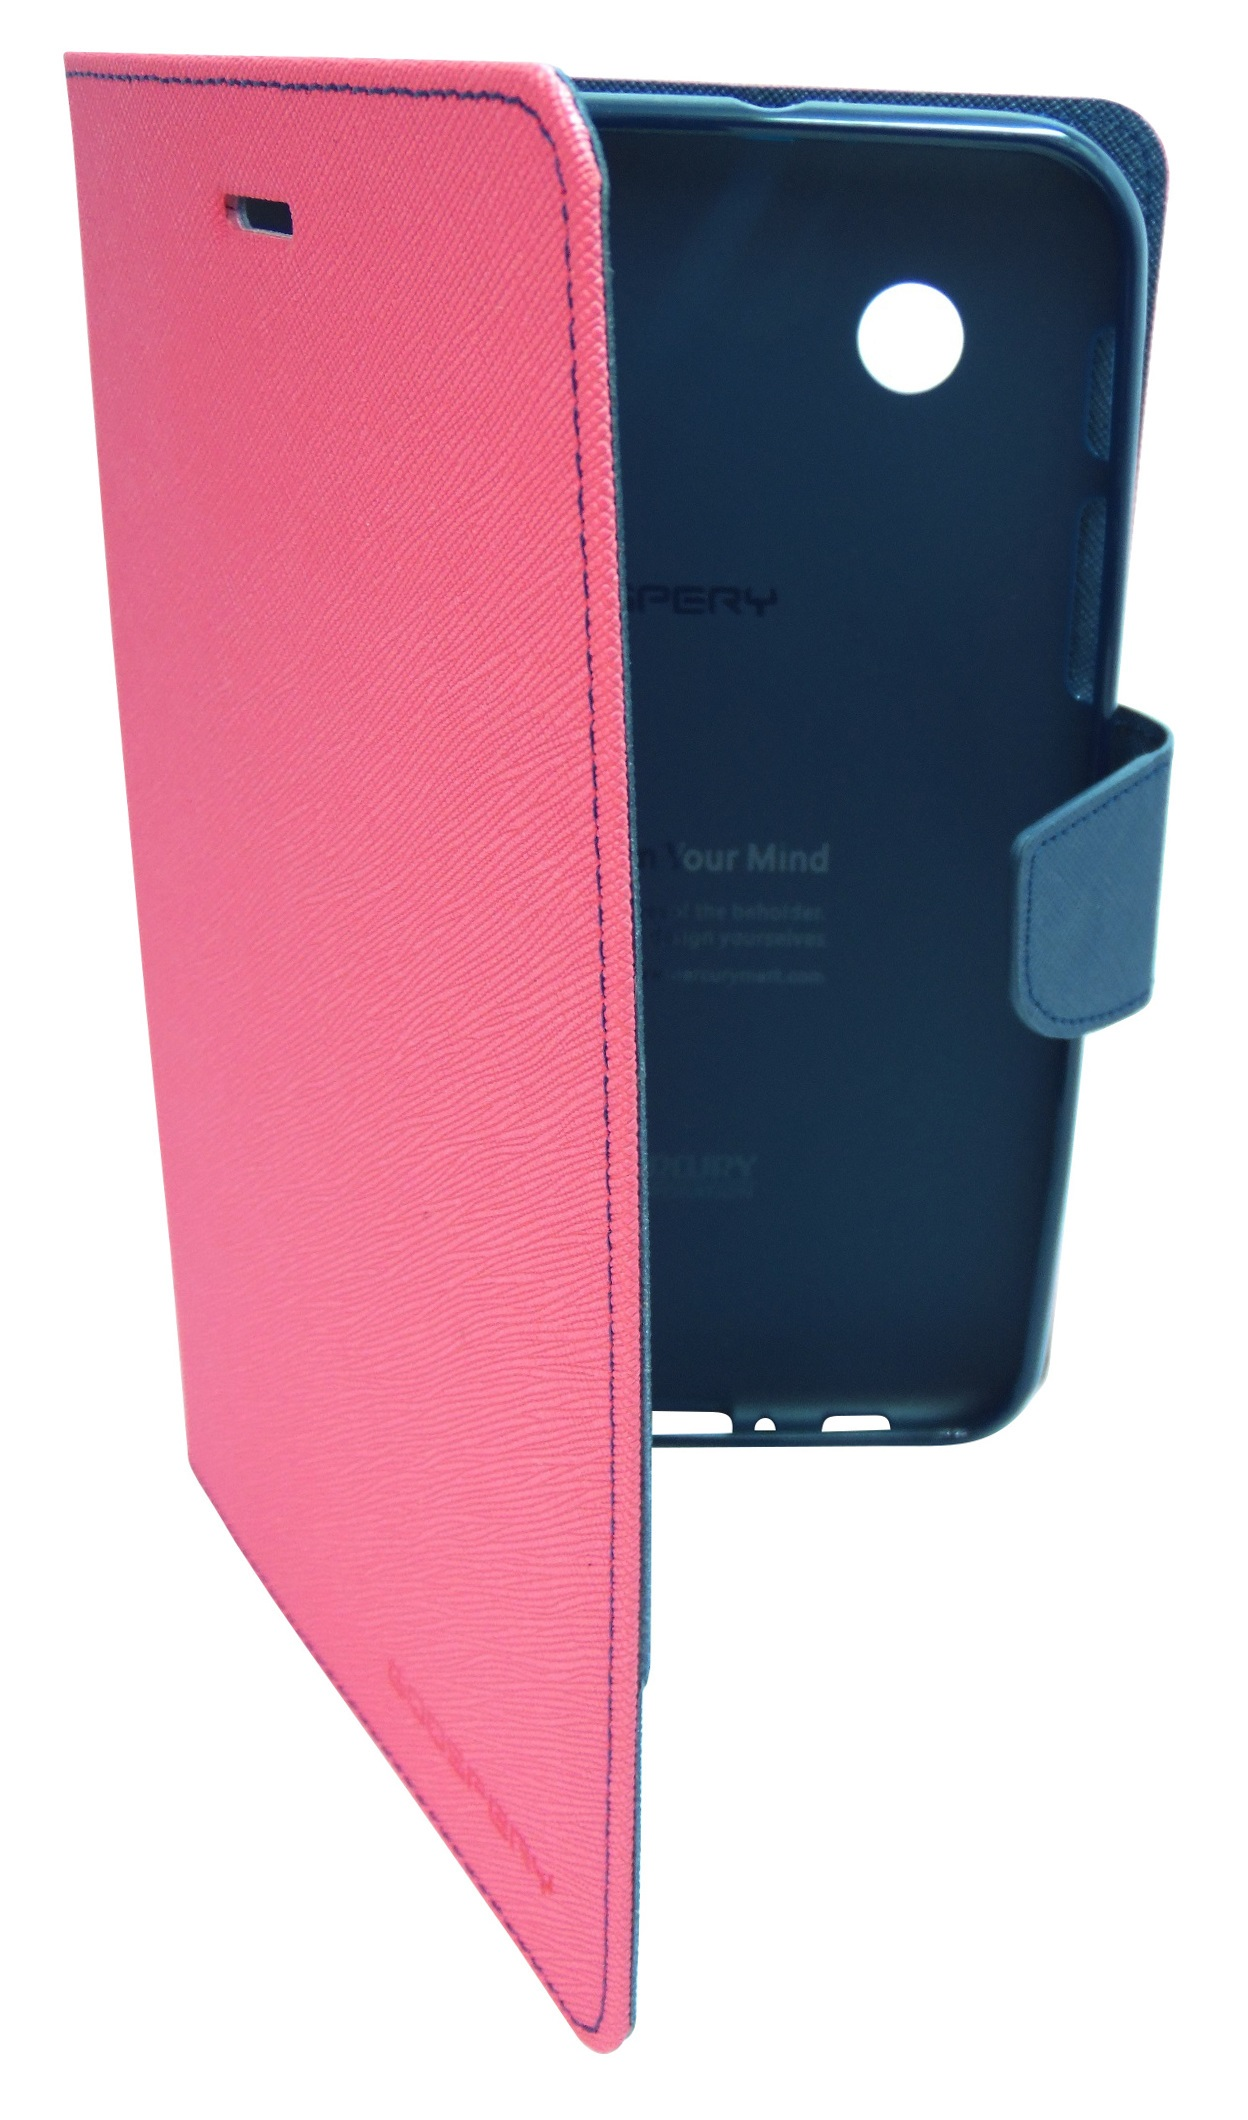 Husa tip carte Mercury Goospery Fancy Diary roz + bleumarin pentru Samsung Galaxy Tab 2 P3100 / P3110